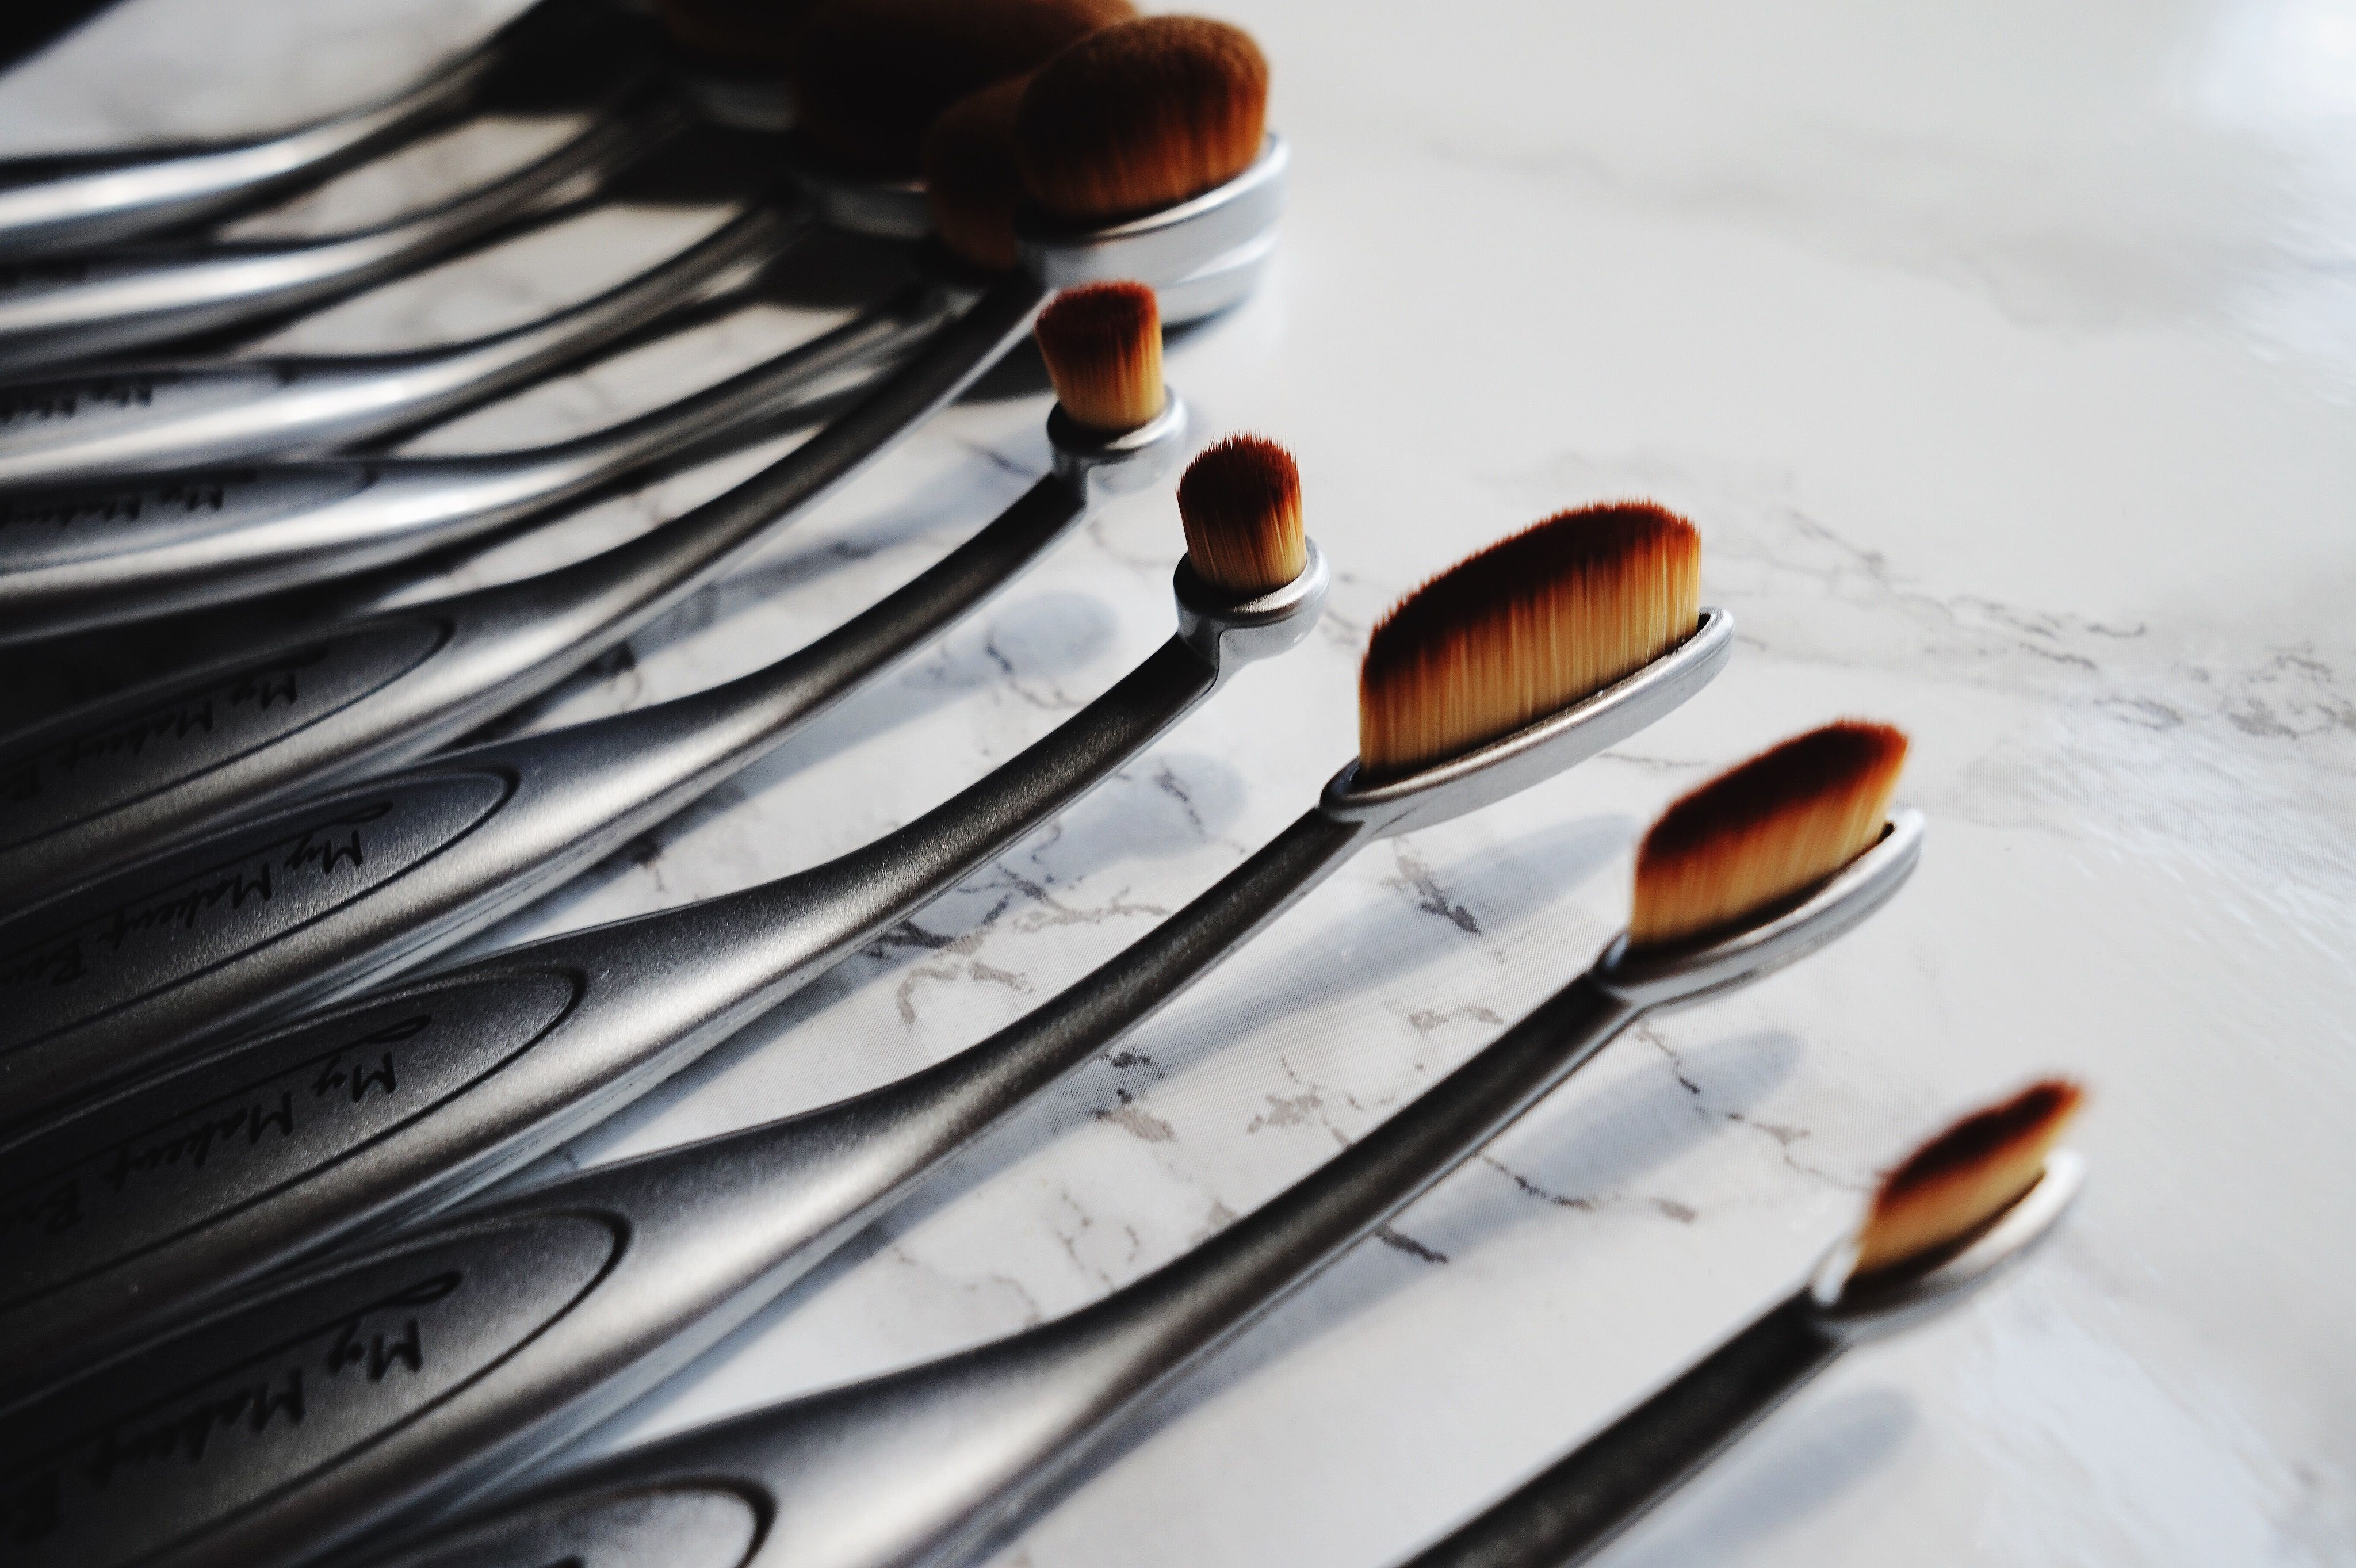 LOVING the Oval Makeup Brush x My Makeup Brush Set My